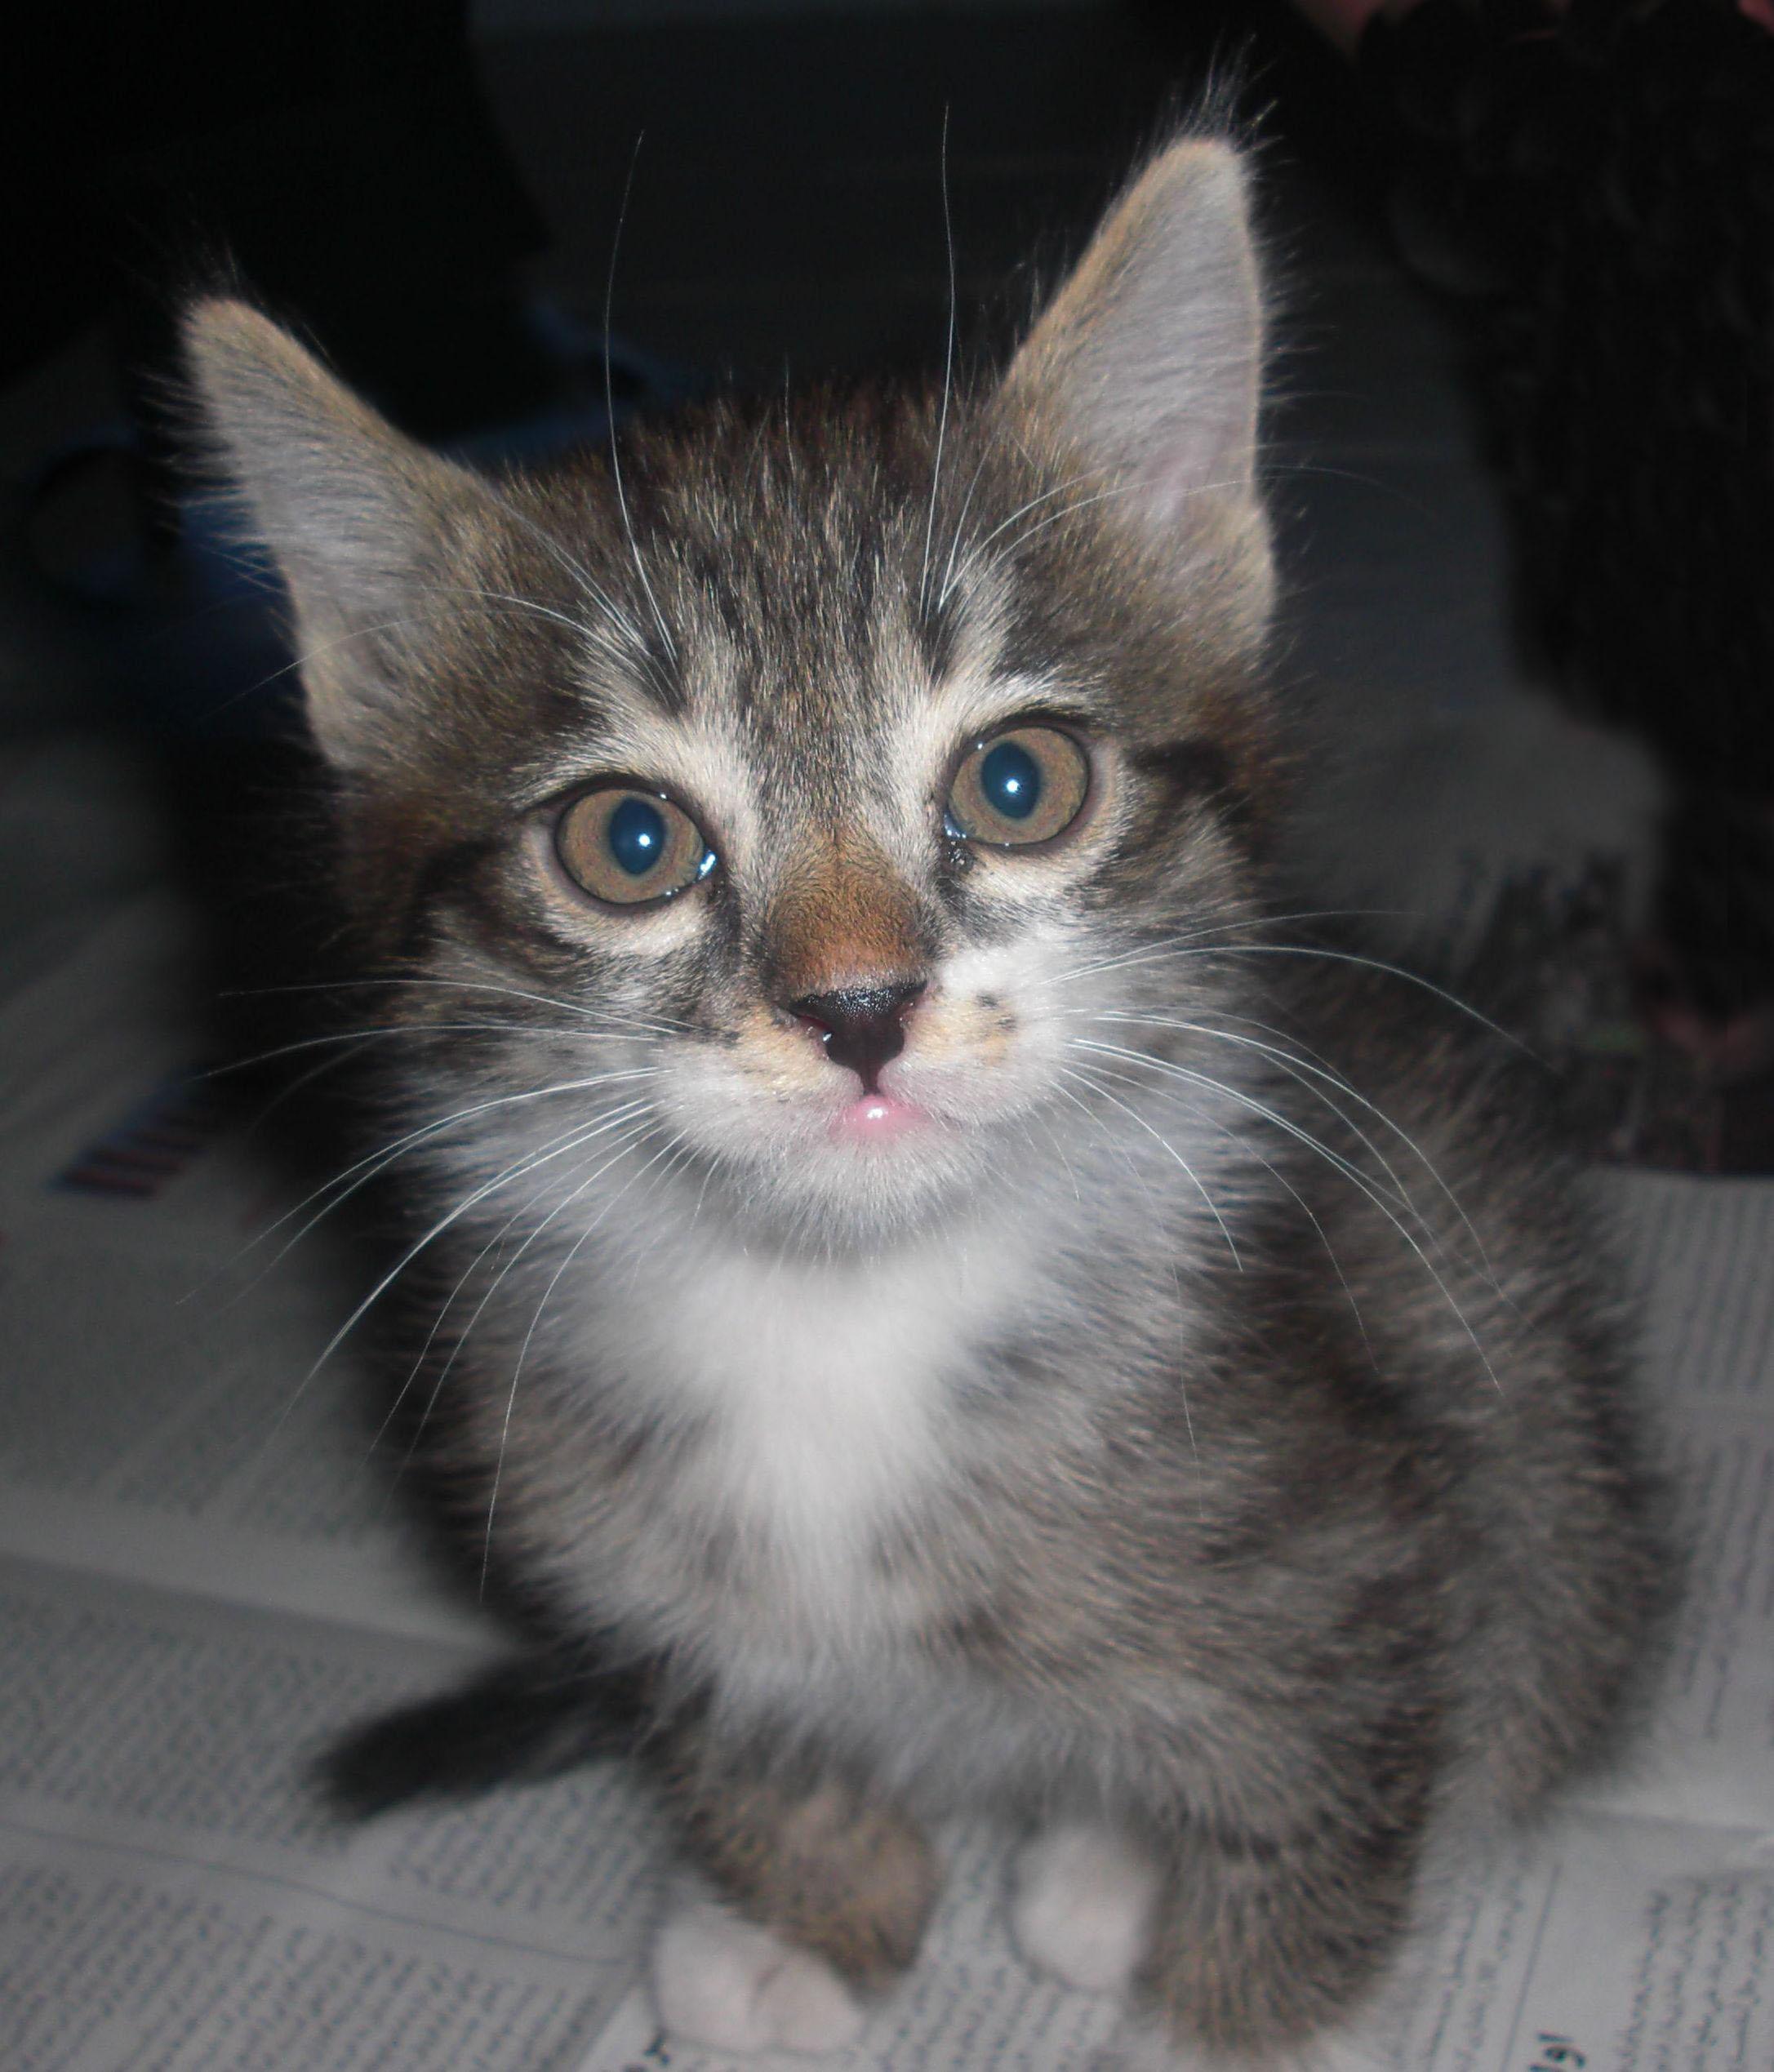 Kot Pręgowany Wikipedia Wolna Encyklopedia